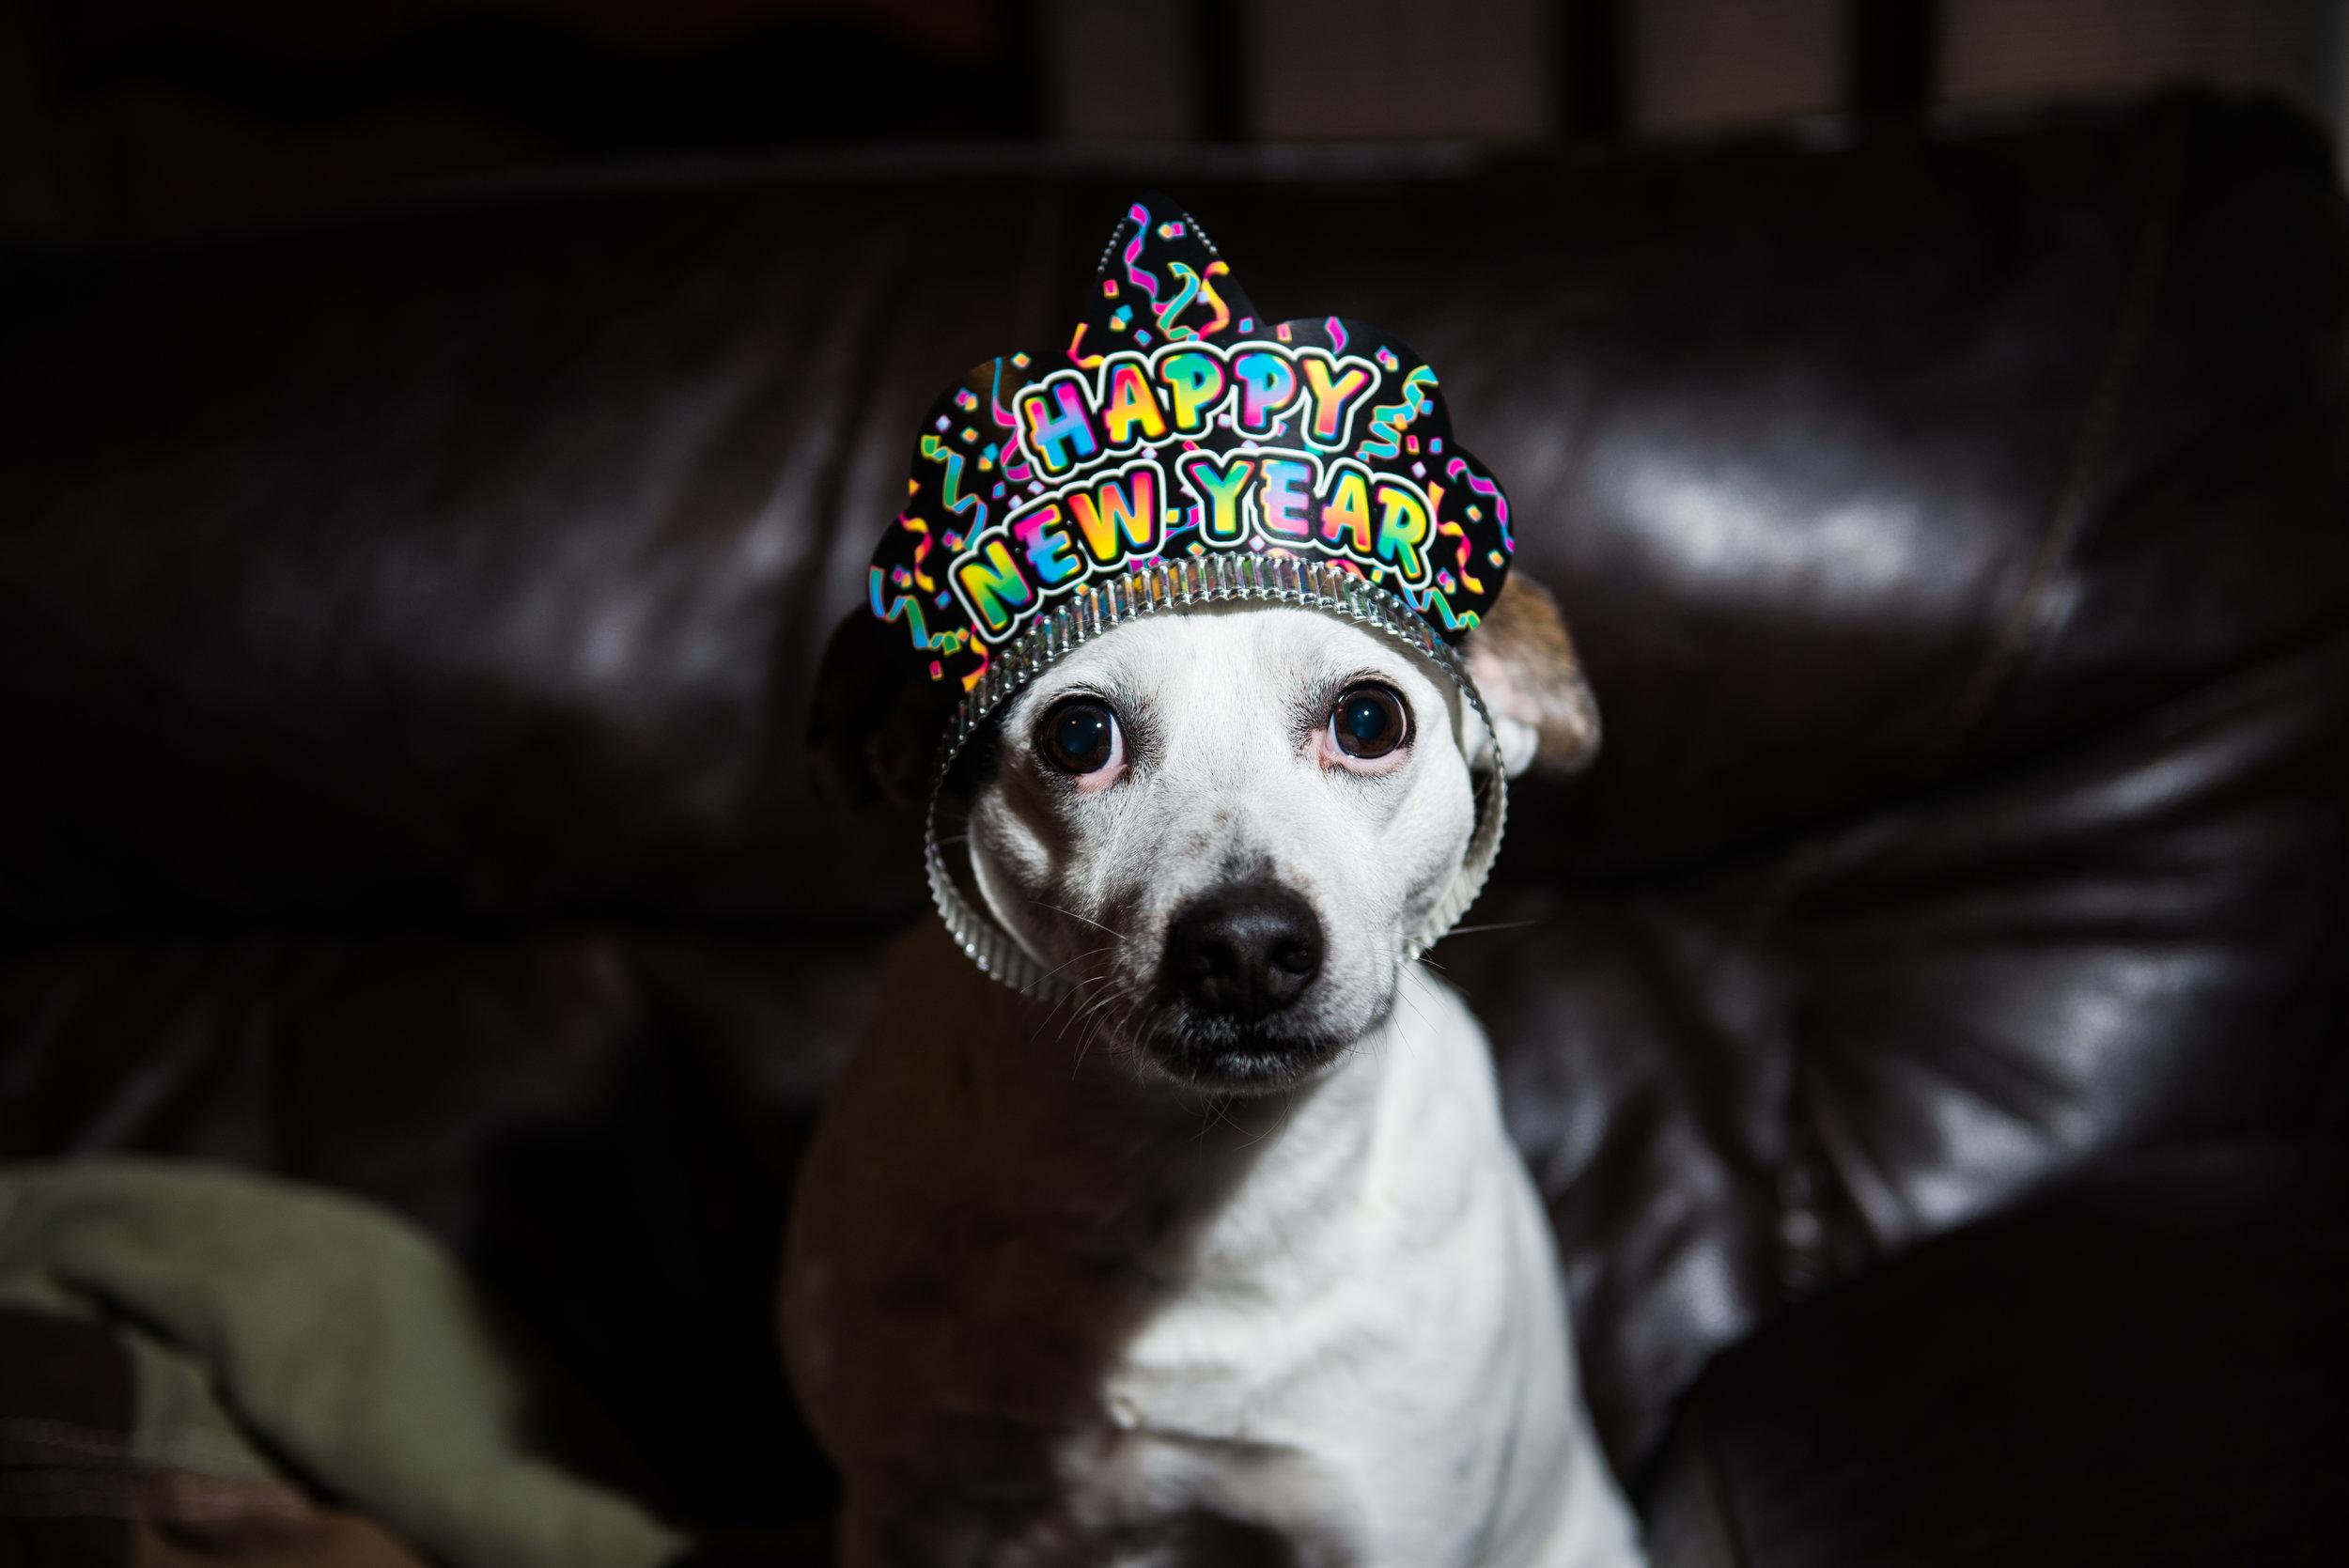 terrier-newyears-hat